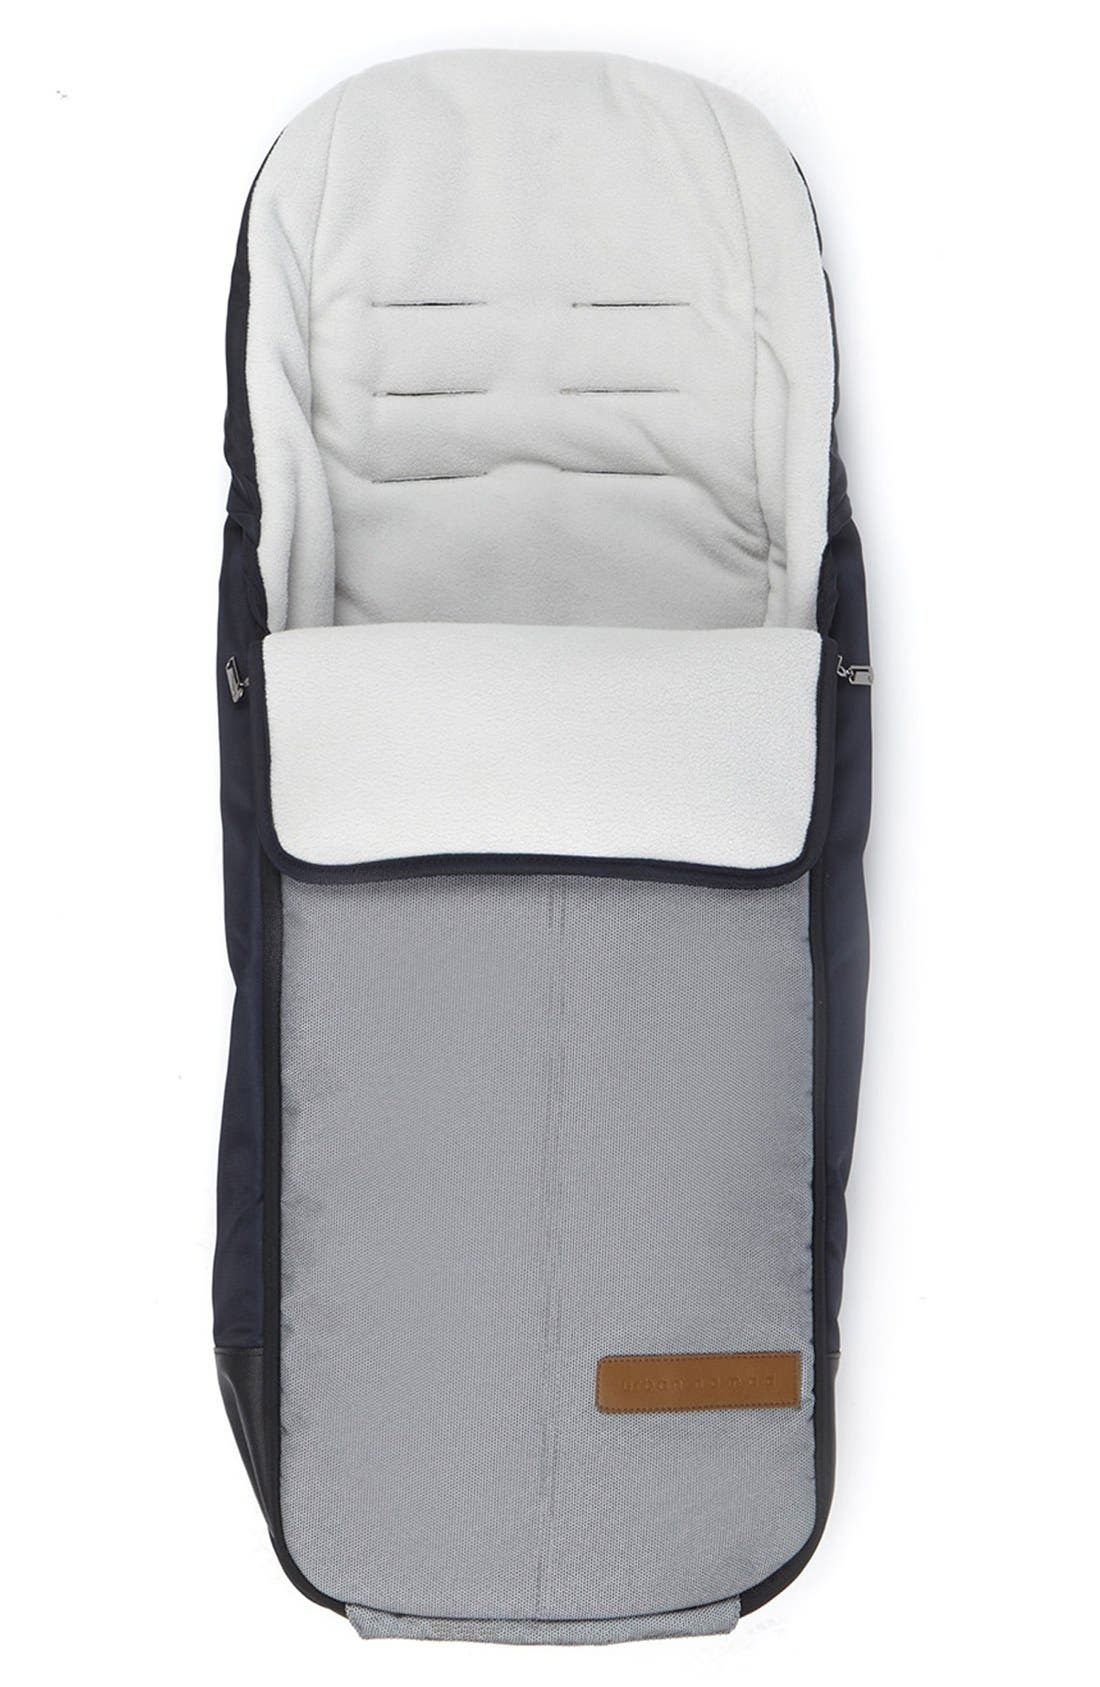 'Igo - Urban Nomad' Water Resistant Footmuff,                         Main,                         color, White/ Blue